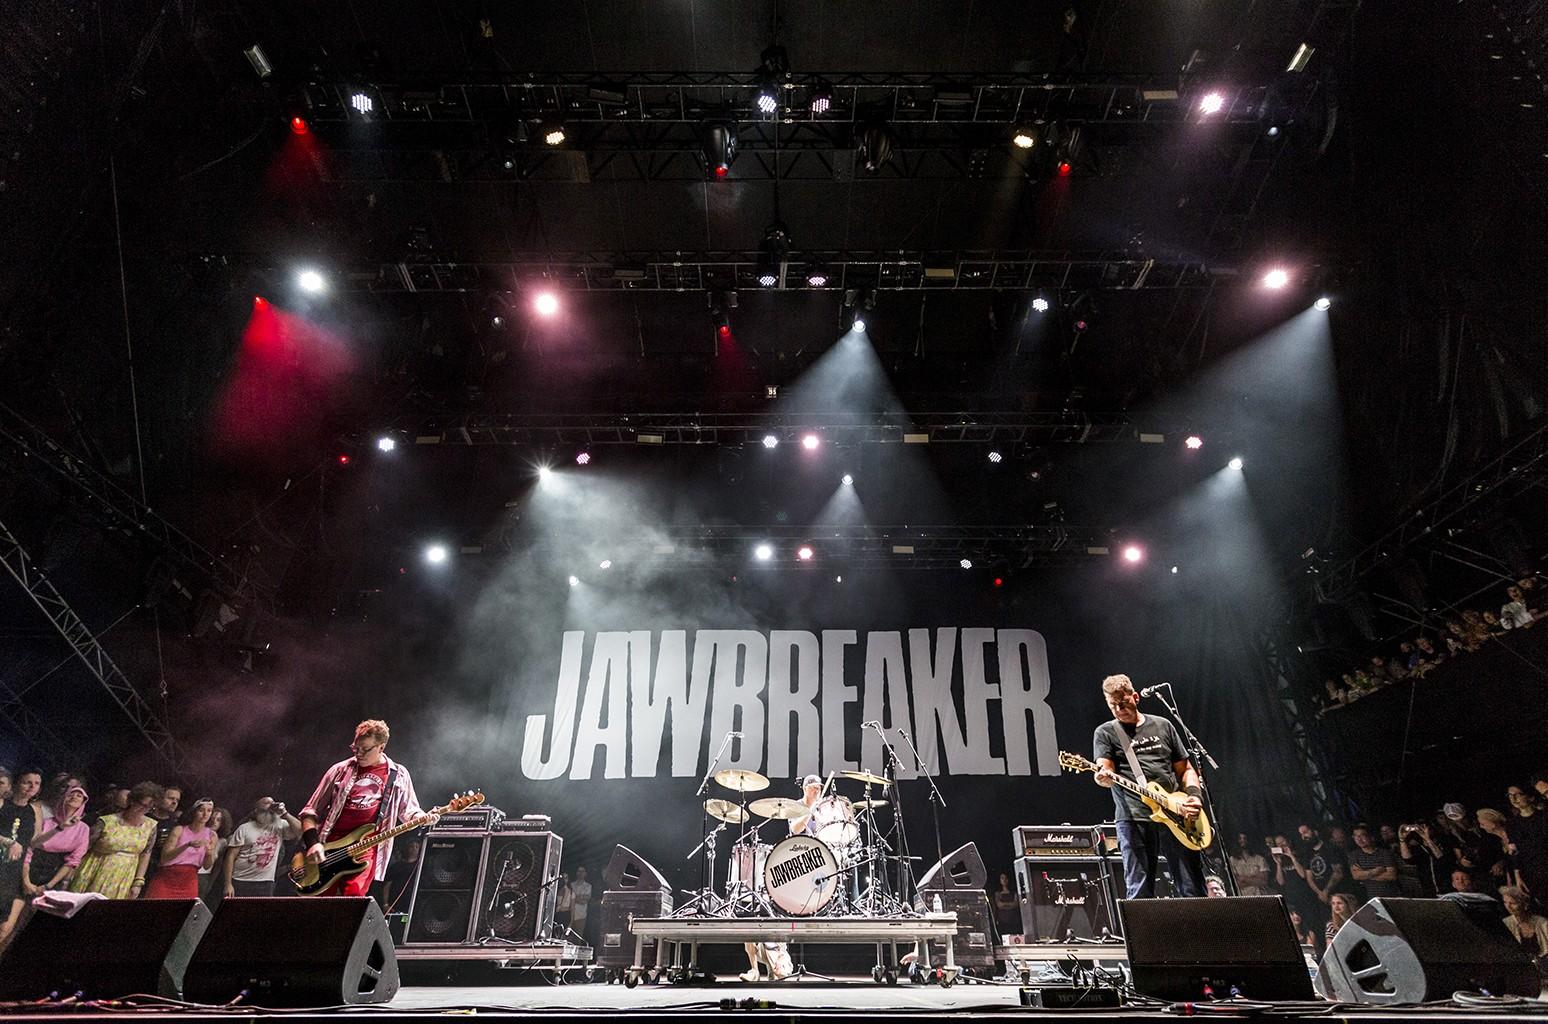 Jawbreaker perform at Riot Fest in Chicago